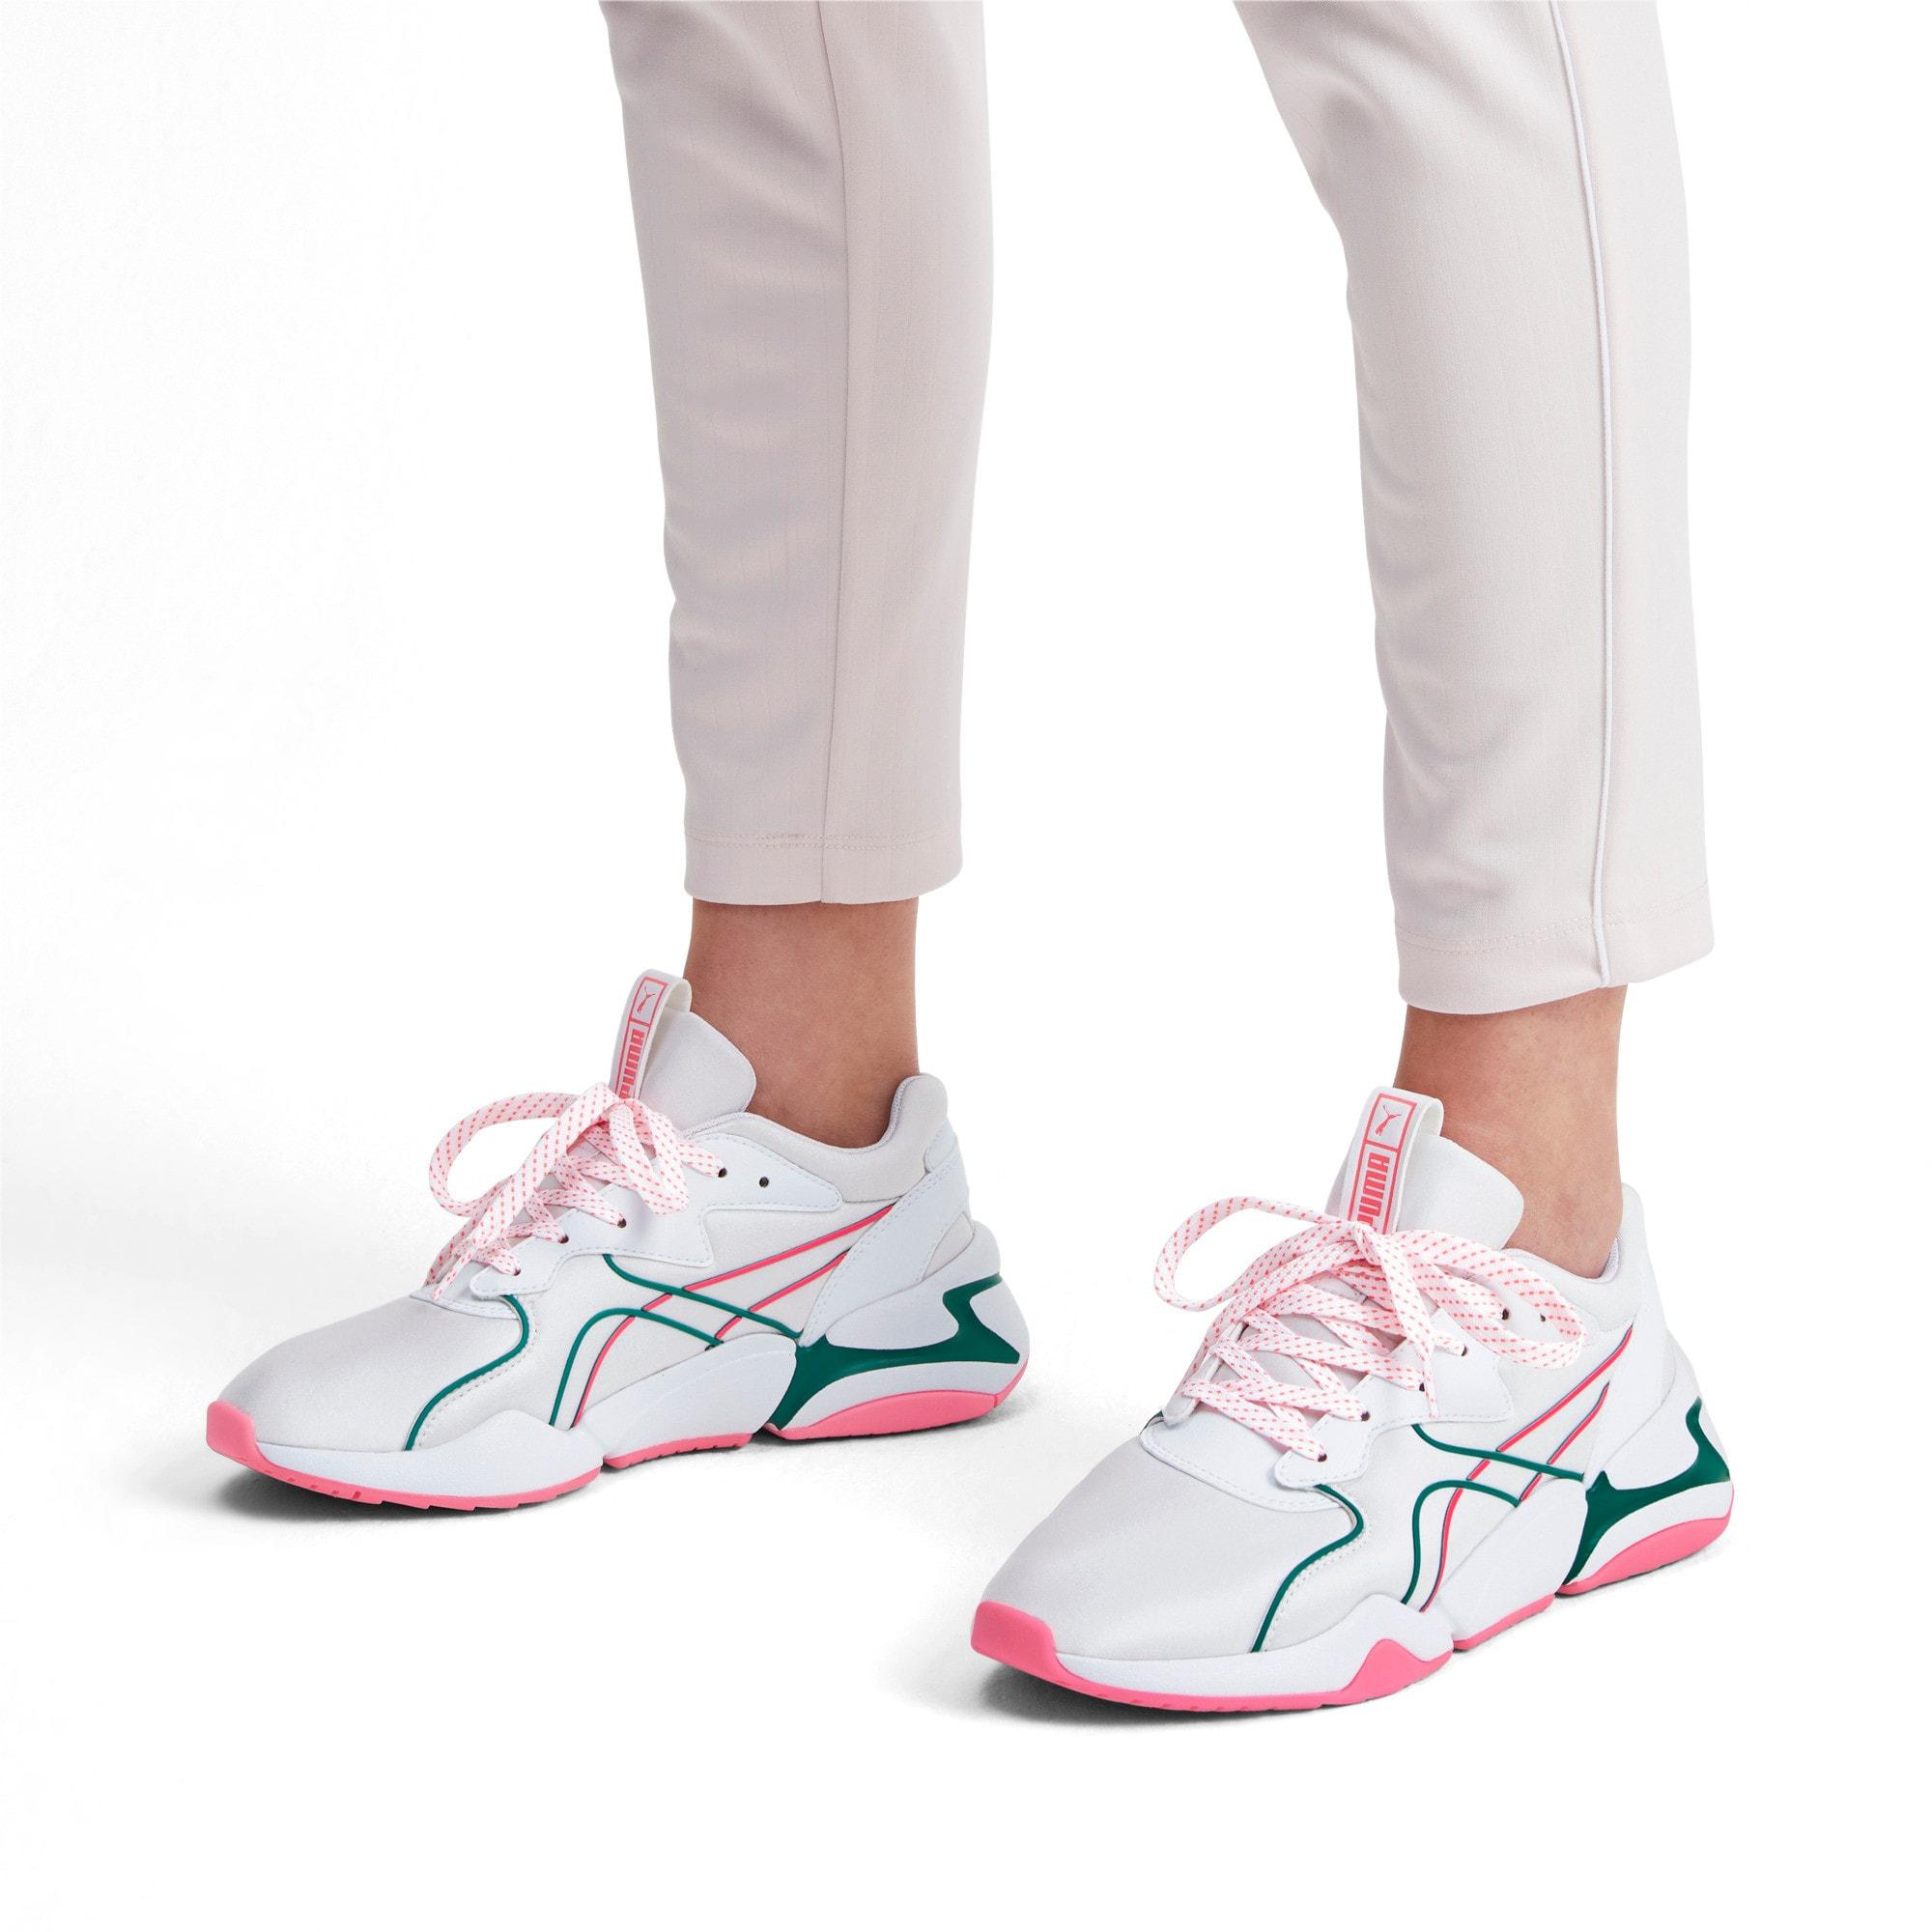 Thumbnail 2 of Nova Hypertech Women's Sneakers, Puma White, medium